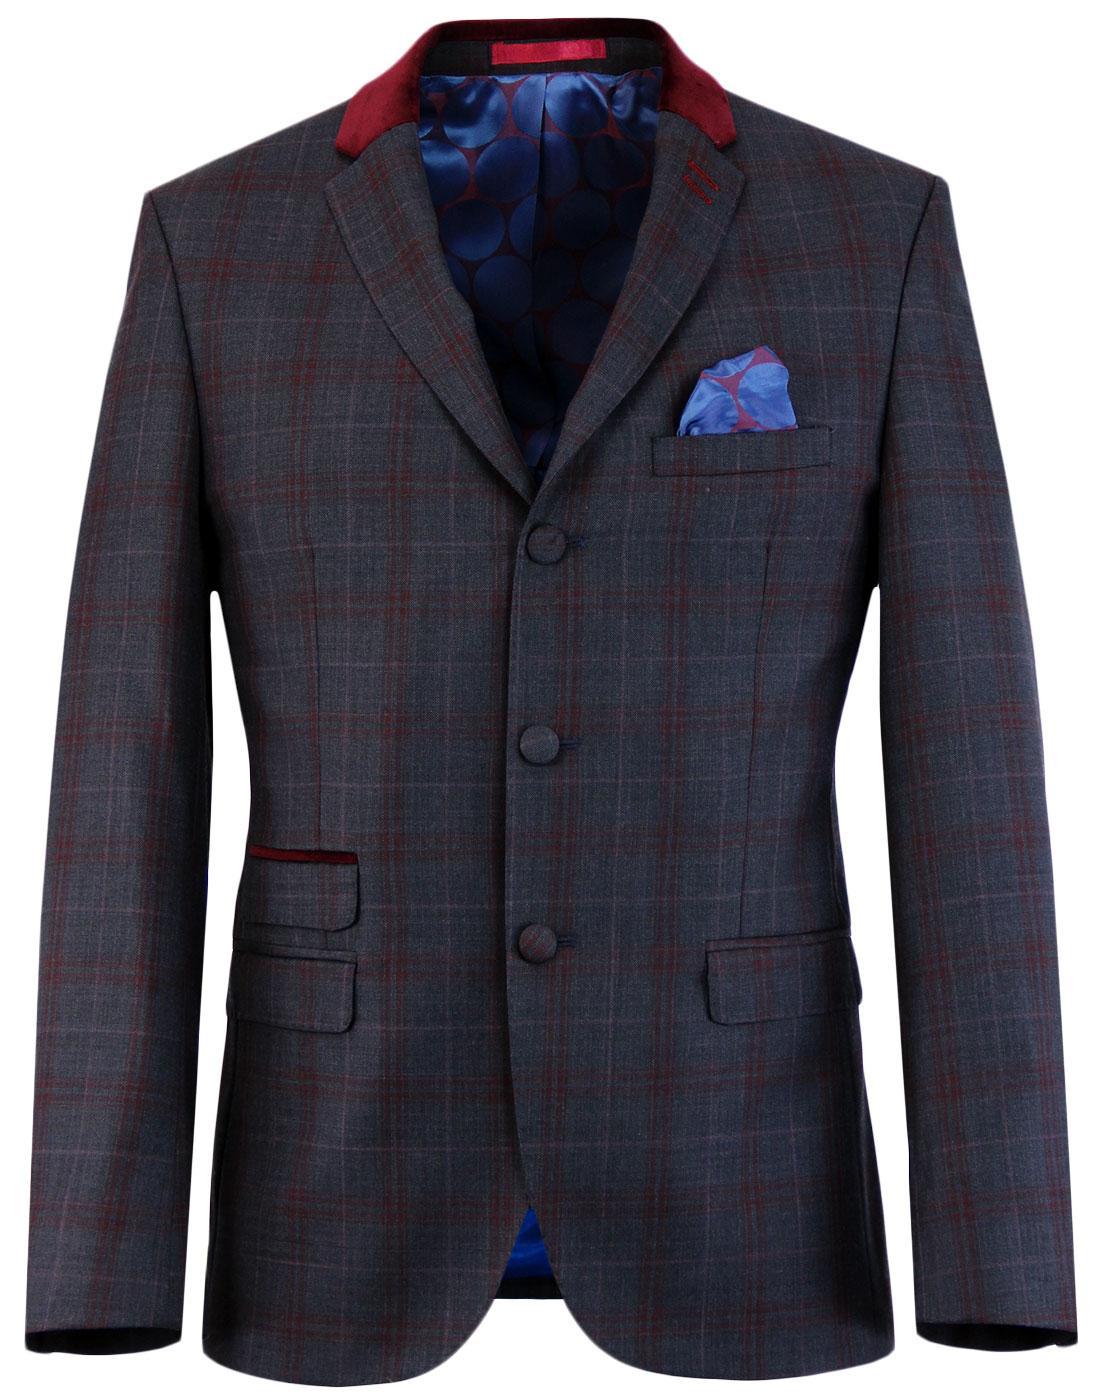 madcap england mod check velvet collar suit jacket